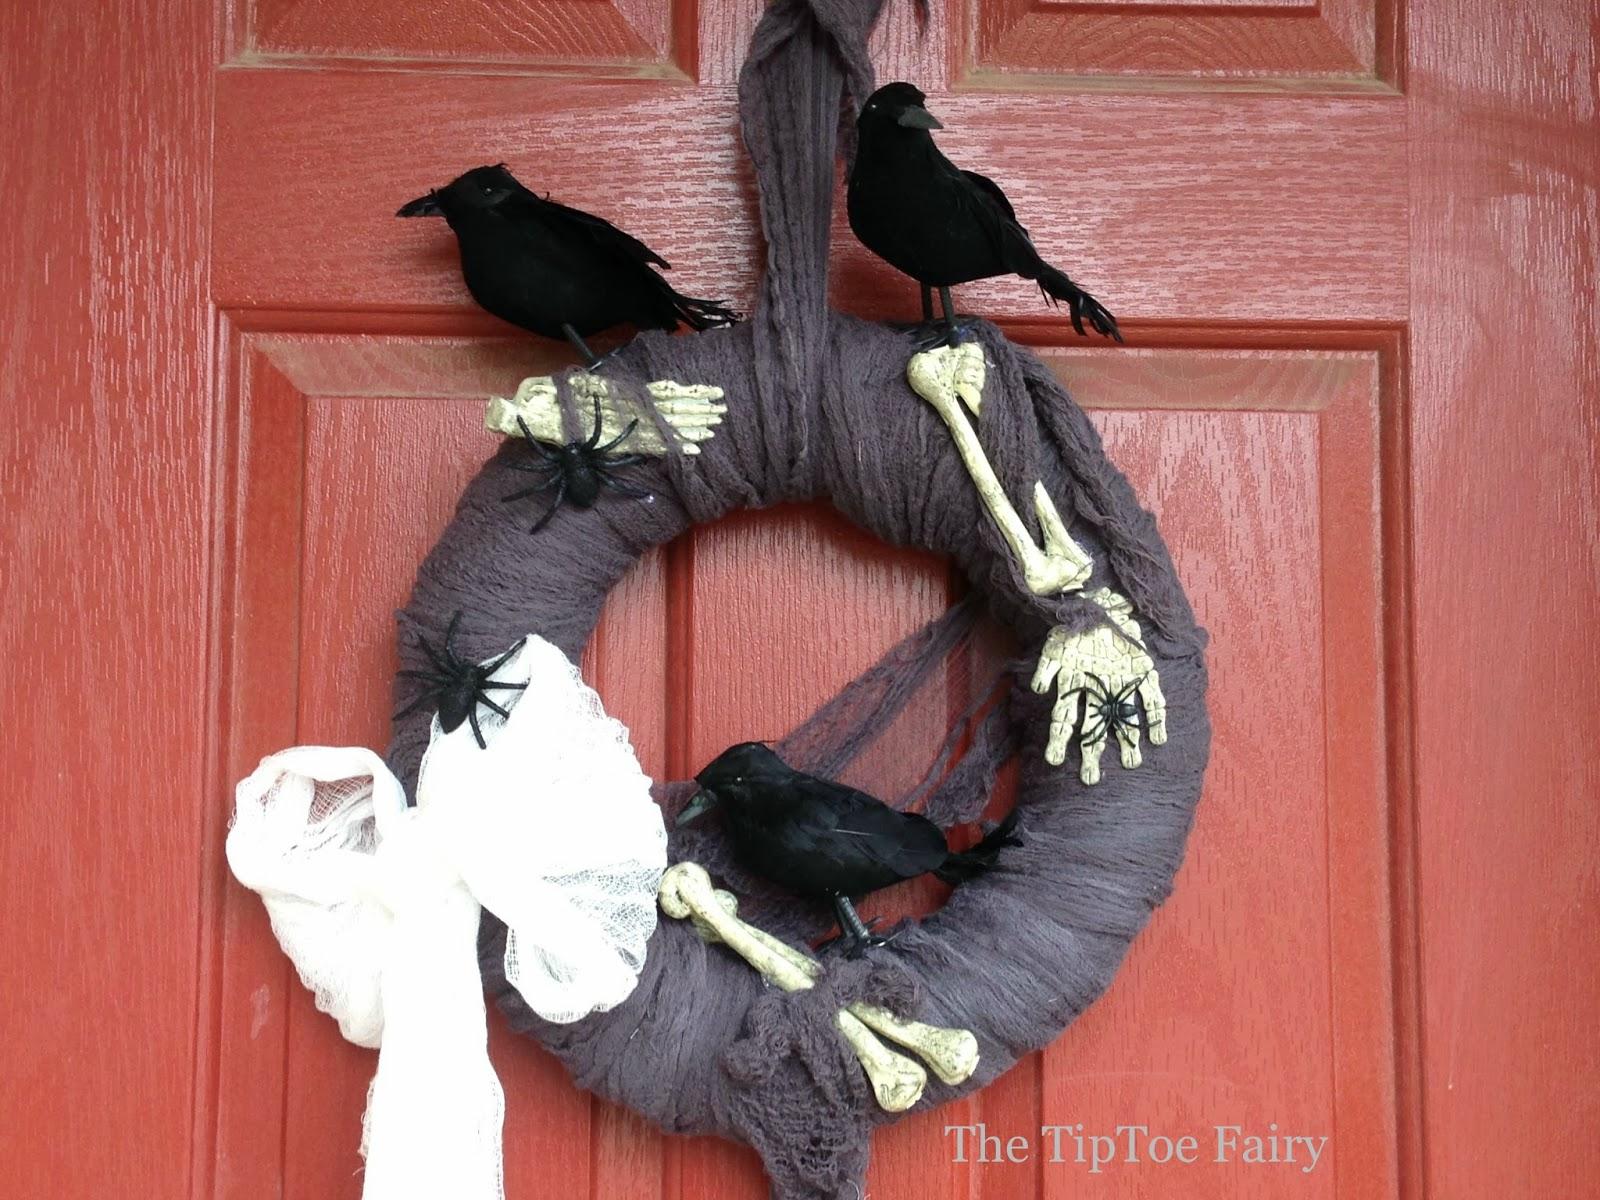 creepy crows and bones halloween wreath the tiptoe fairy halloweendecorations halloween wreathtutorial